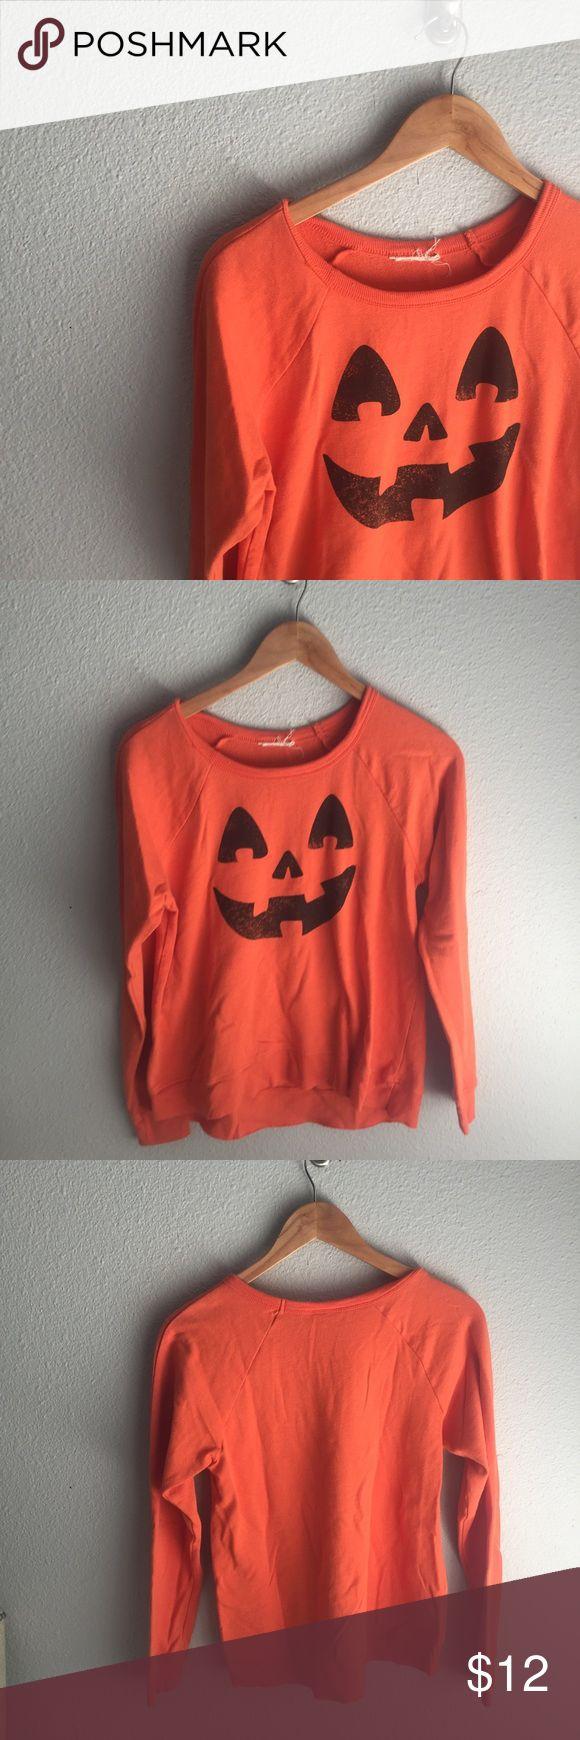 jack o lantern sweatshirt adorable Halloween sweatshirt with cute pumpkin 🎃 face!  I ❤️reasonable offers! 🛍bundle discount- 2+ 20% off 🚫trades/try ons/PP Tops Sweatshirts & Hoodies